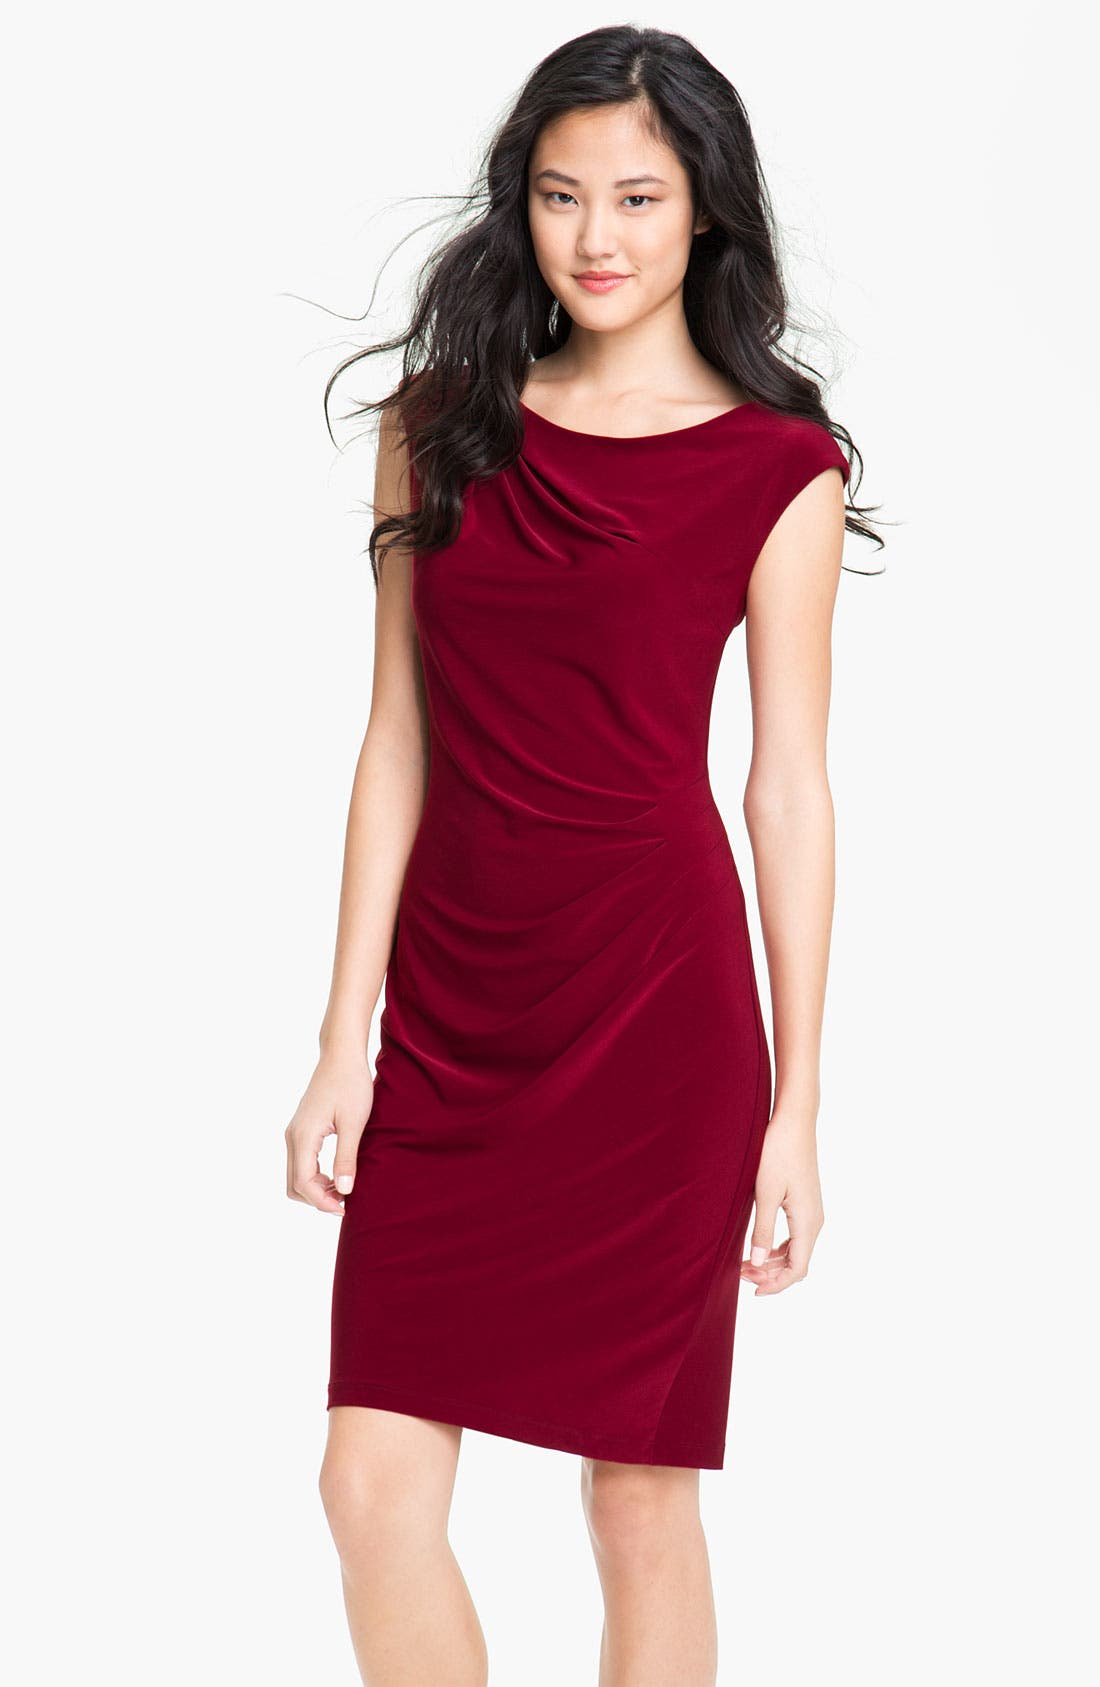 Alternate Image 1 Selected - Alex & Ava Cap Sleeve Jersey Sheath Dress